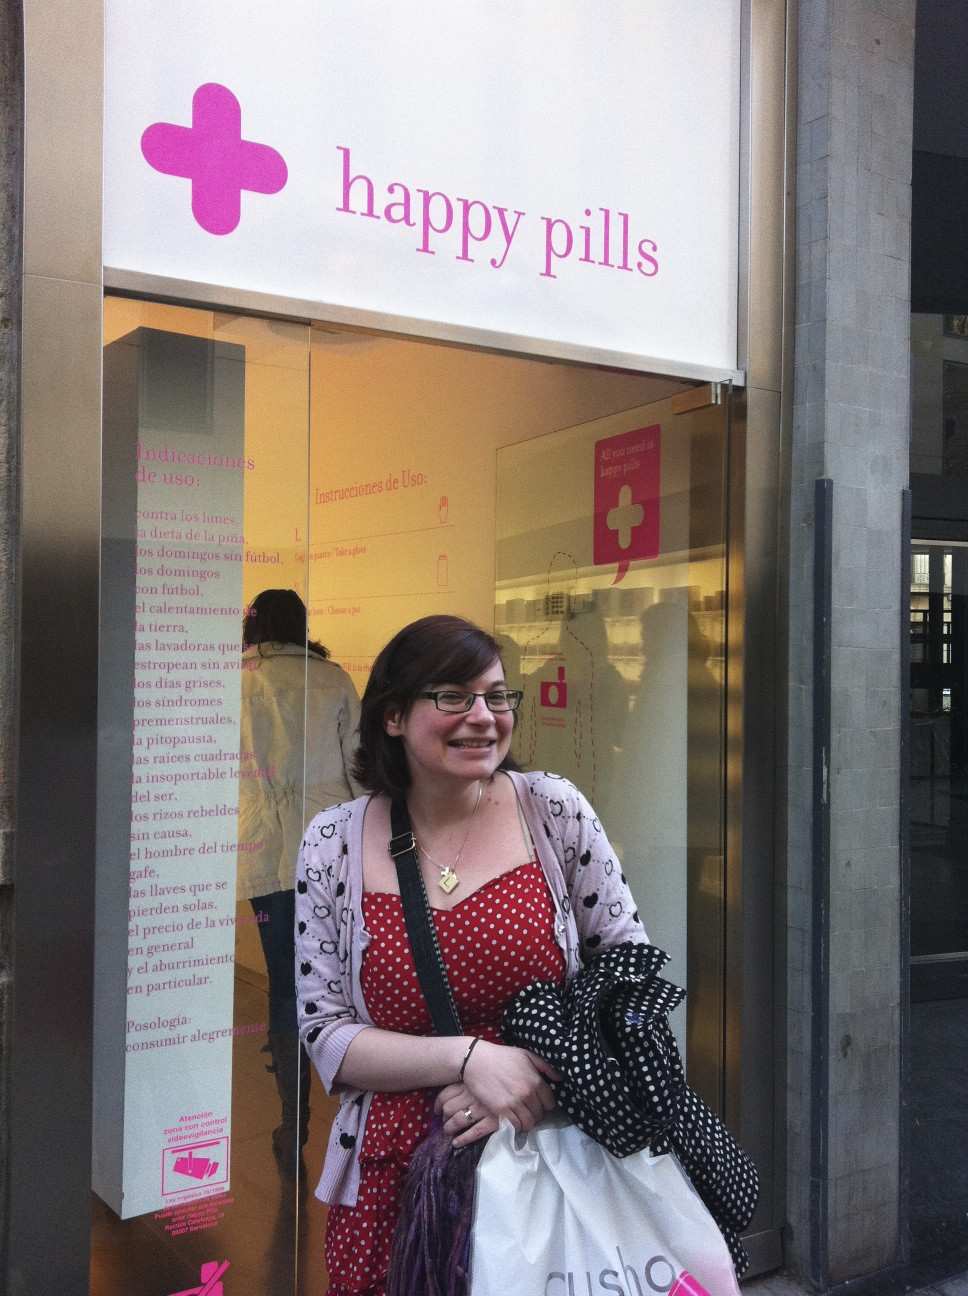 Fluoxetine Happy Pill